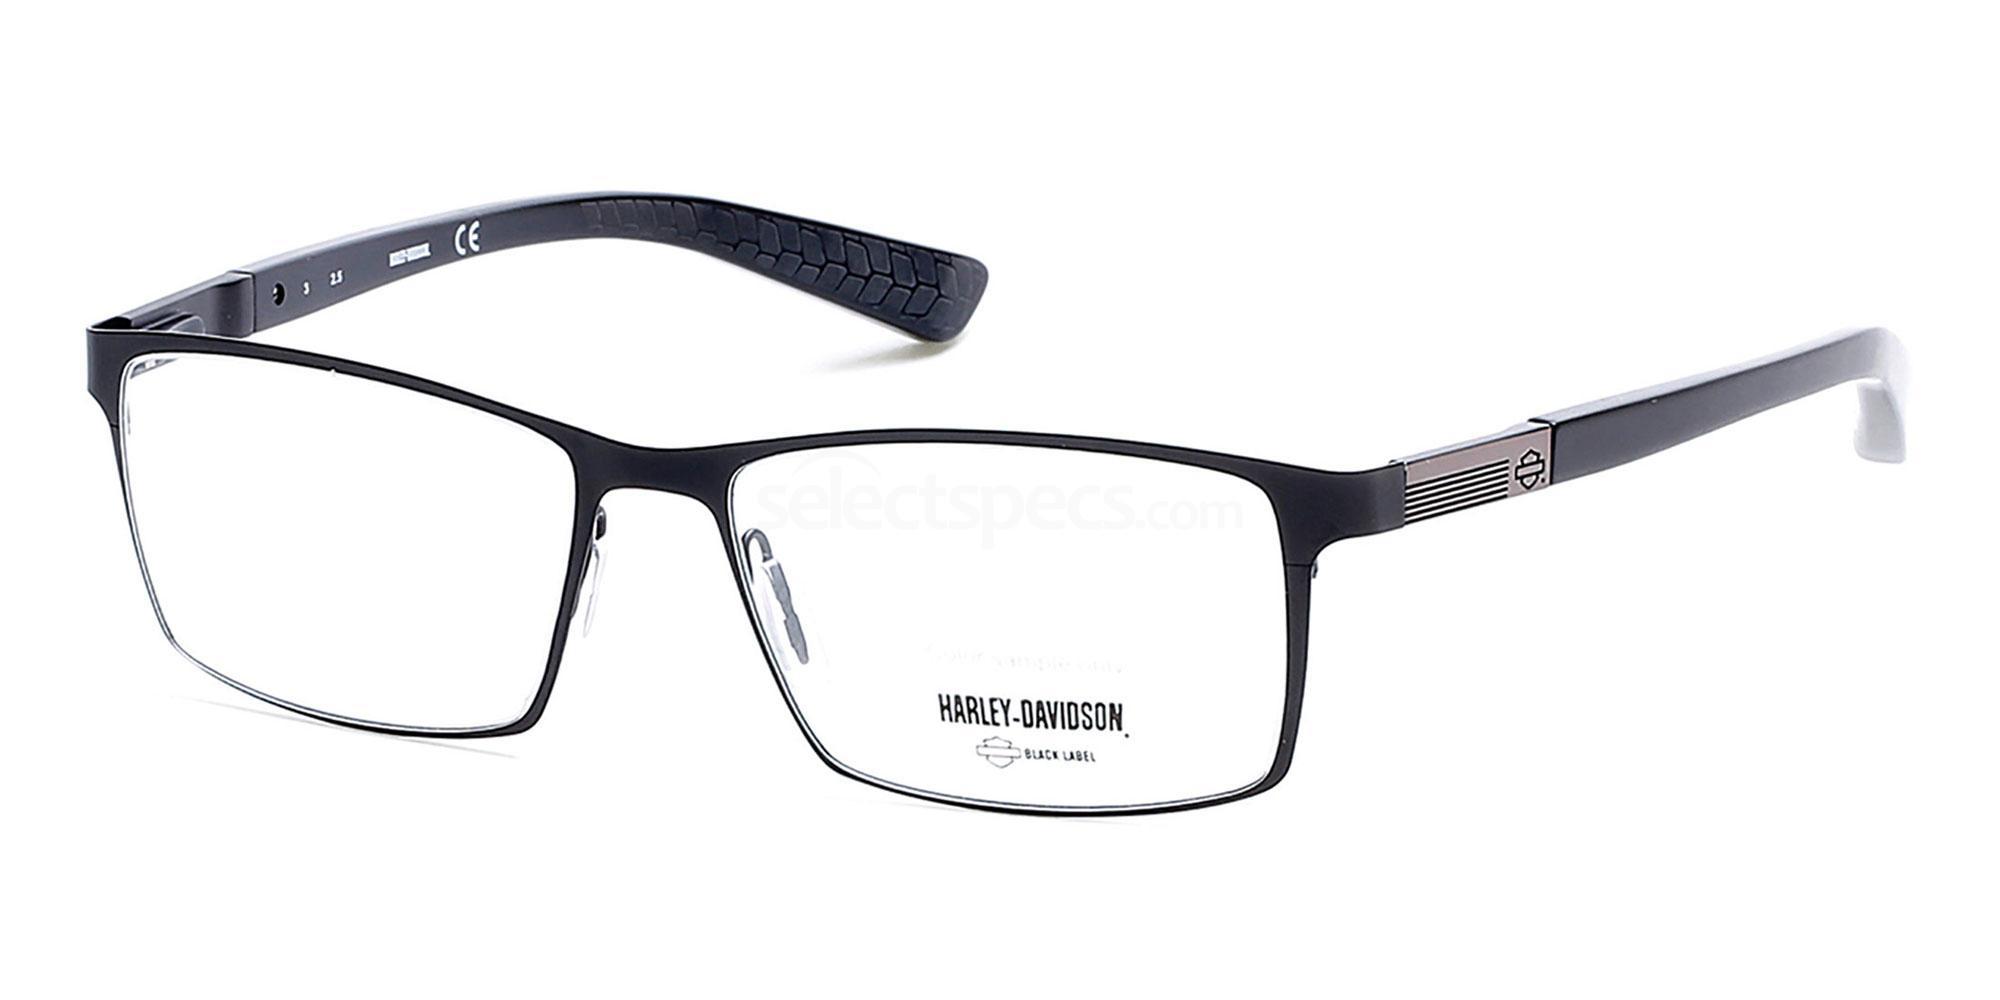 002 HD 1034 Glasses, Harley Davidson